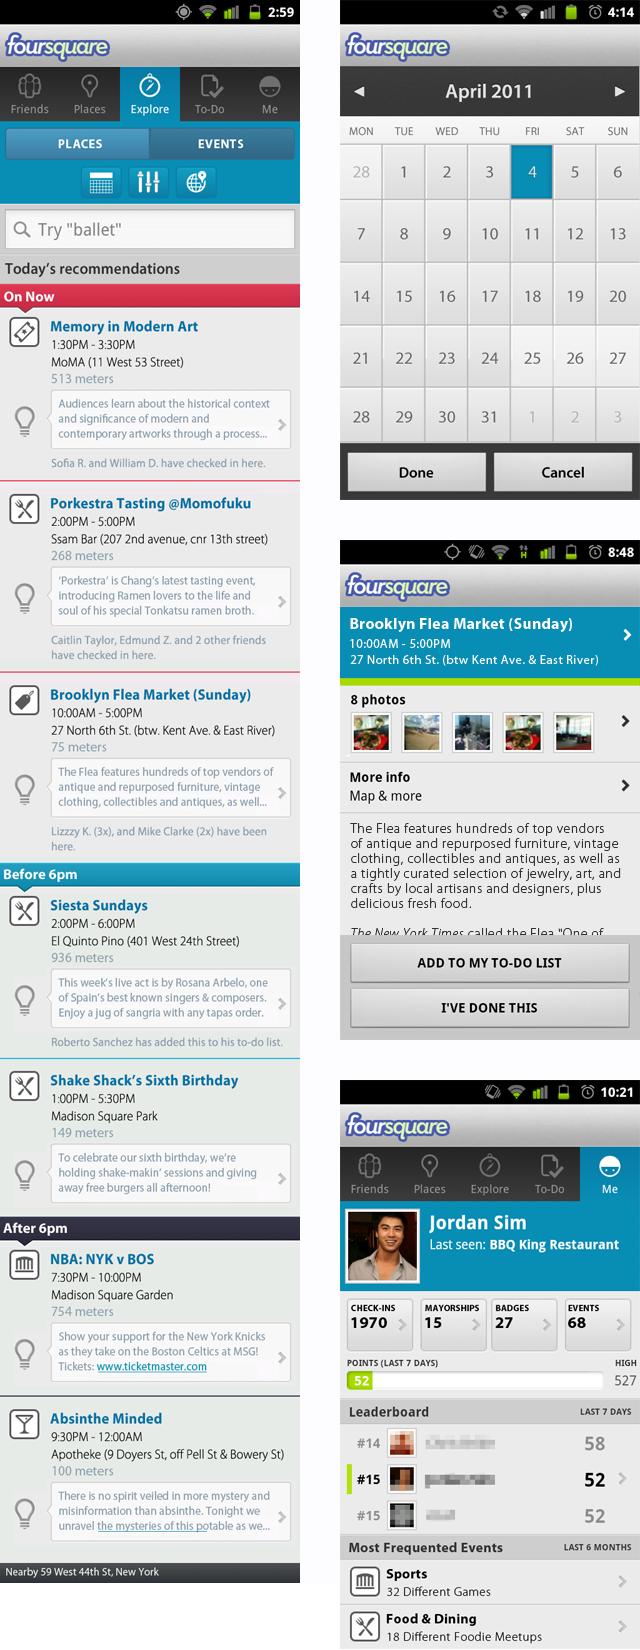 Foursquare Explore Feature - Designed by Jordan Sim